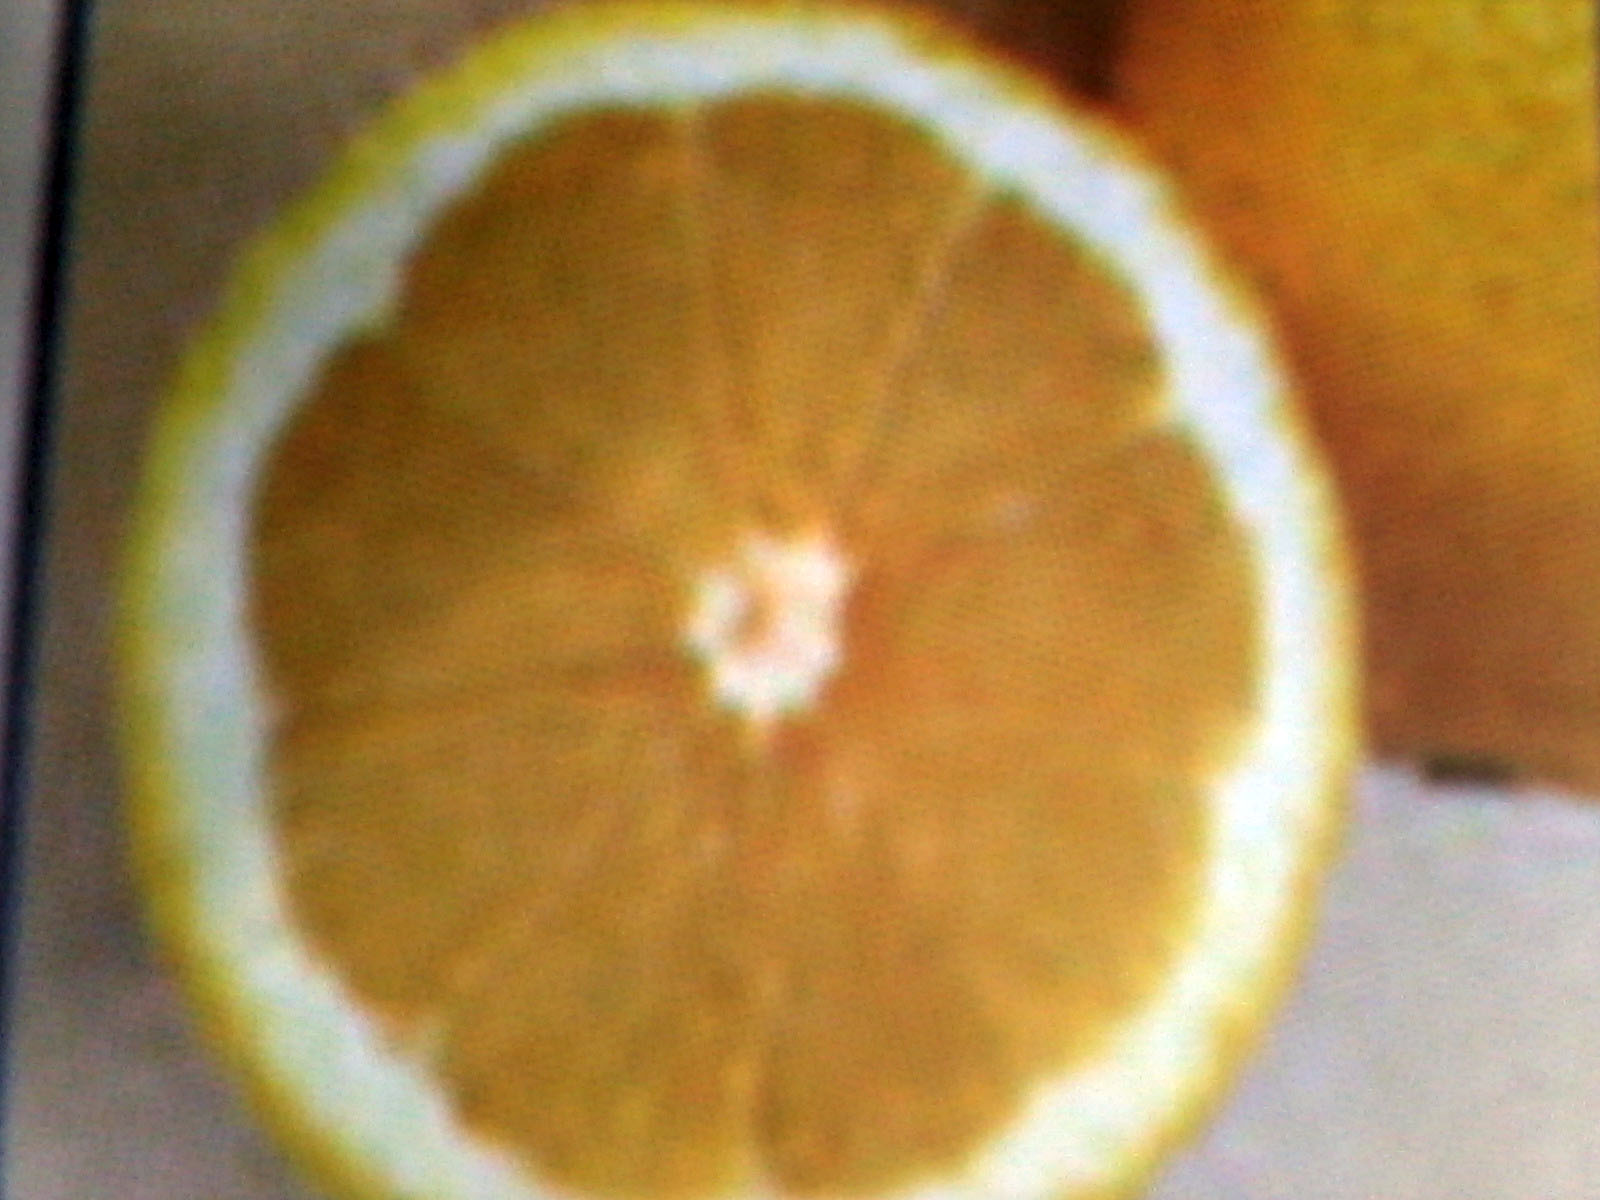 15 Manfaat Buah Manggis Bagi Kesehatan